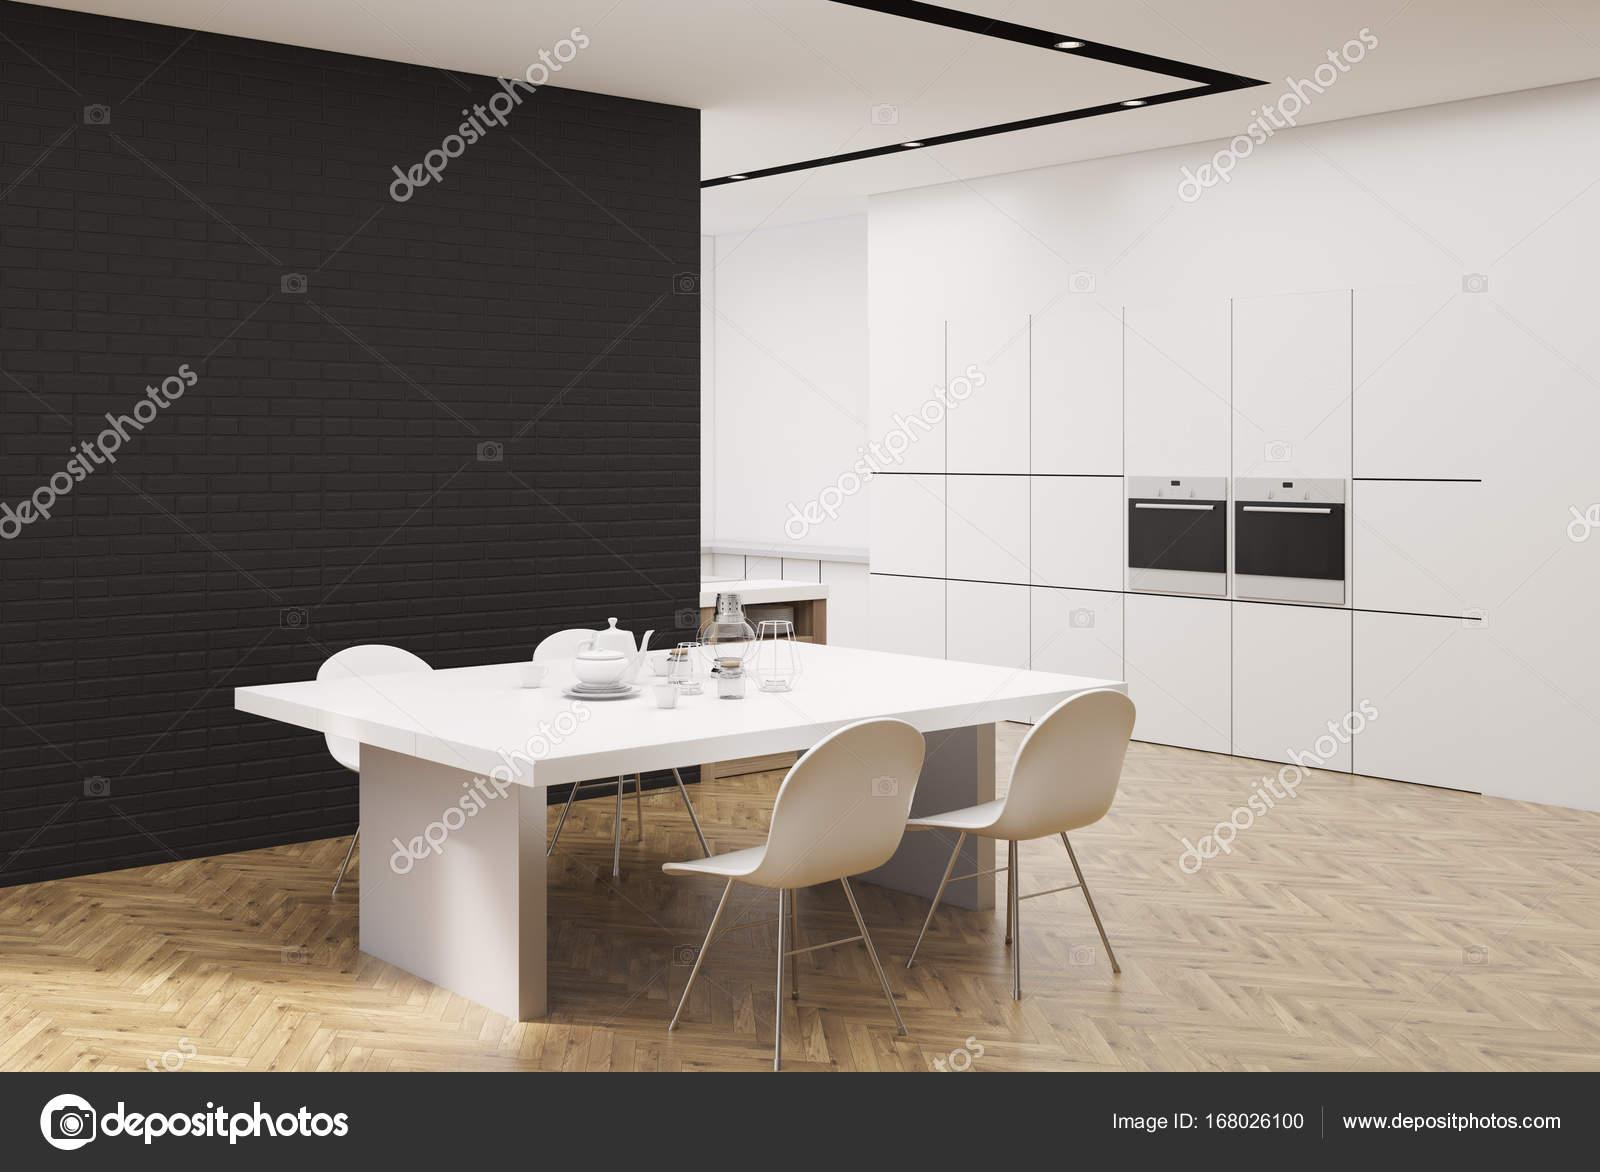 black kitchen tables painting cabinets cost 白色和黑色的厨房用一张桌子 角 图库照片 c denisismagilov 168026100